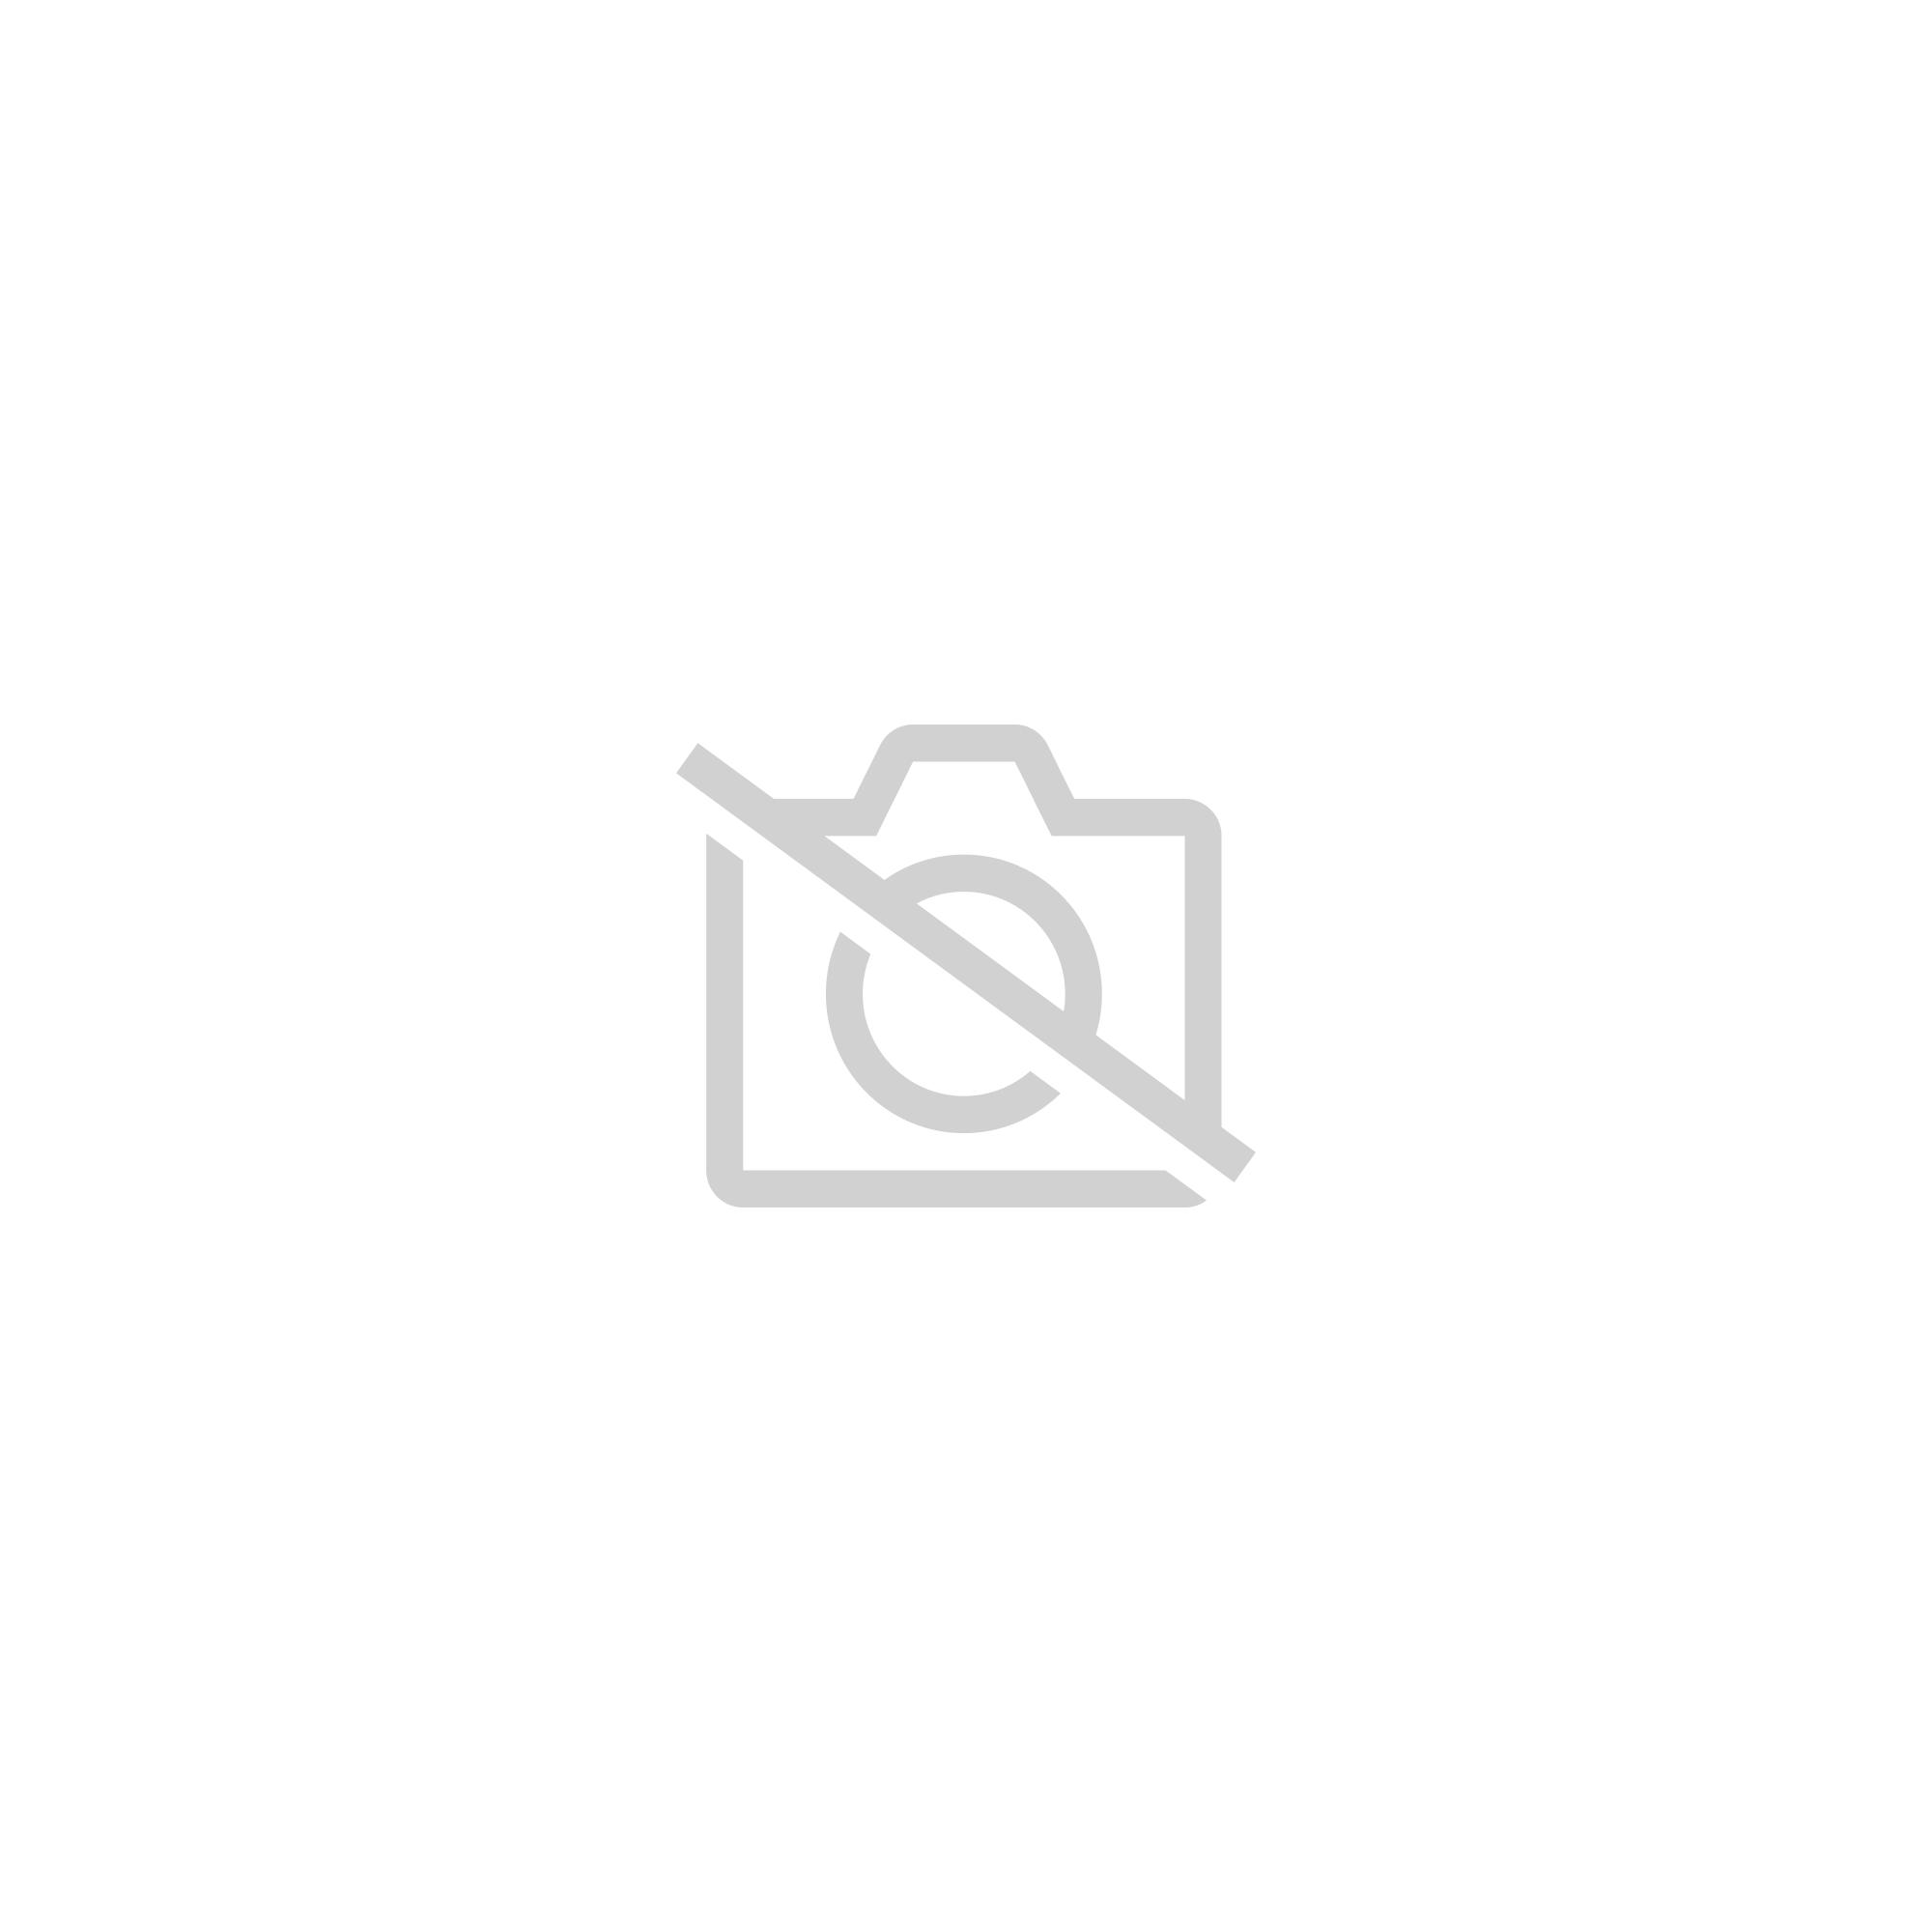 Lighting Returns - Final Fantasy Xiii